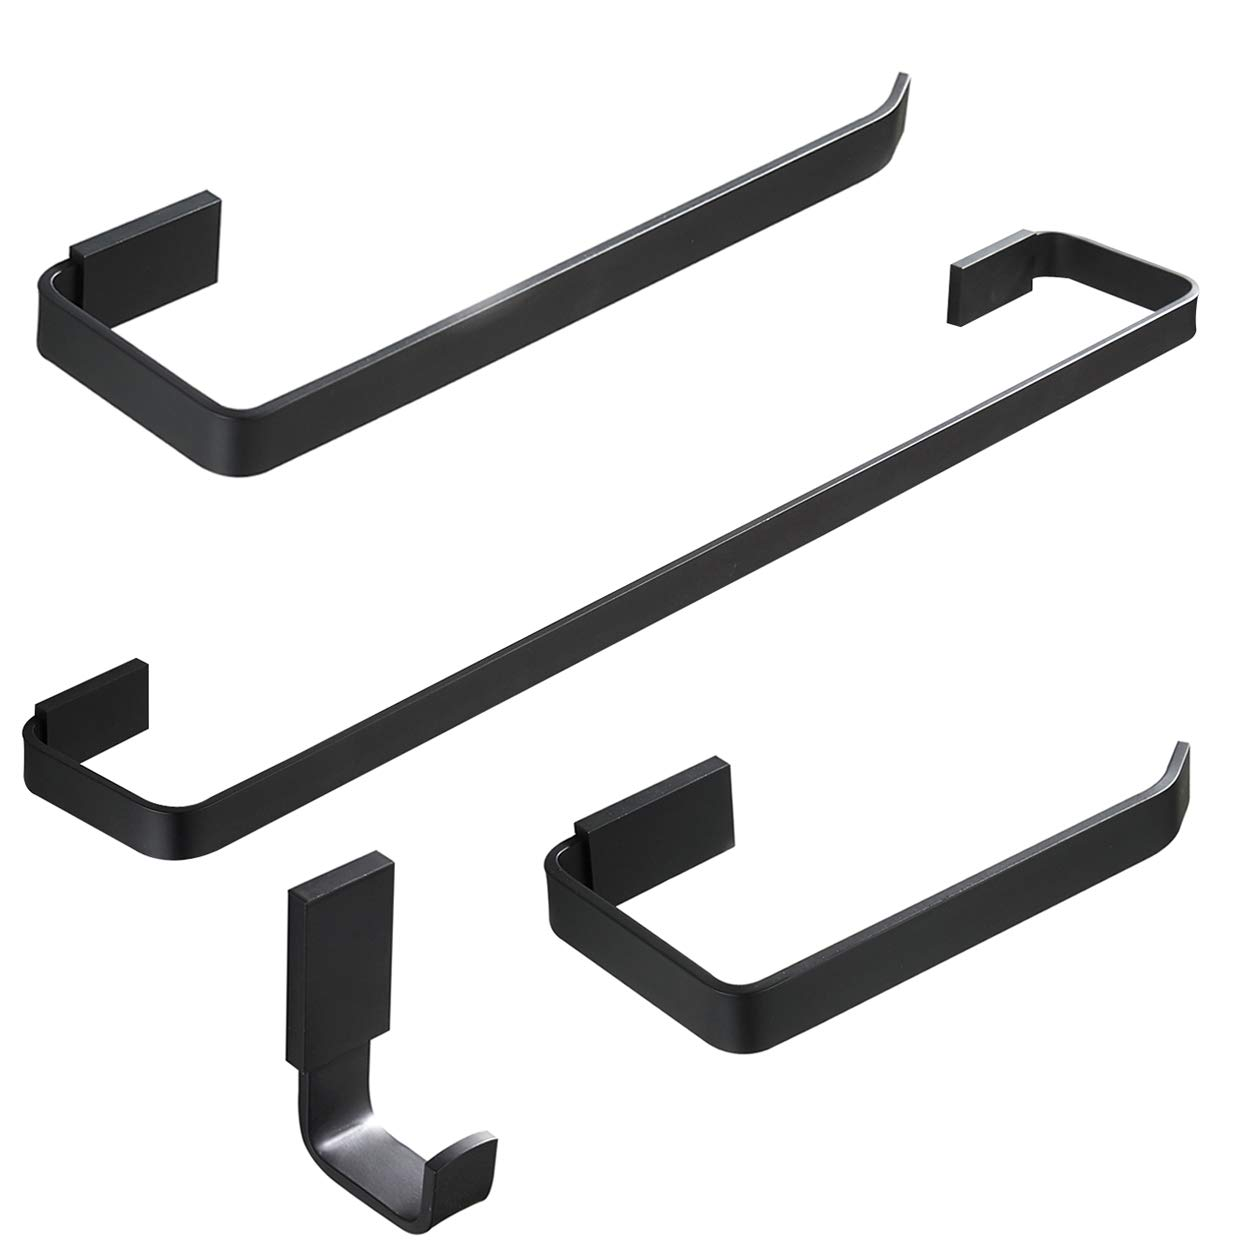 Keybath Bathroom Accessories 4-Piece Hardware Set Matte Black Towel Bar Toiler Paper Holder Towel Ring Towel Hook Brass Wall Mounted for Bathroom Kitchen